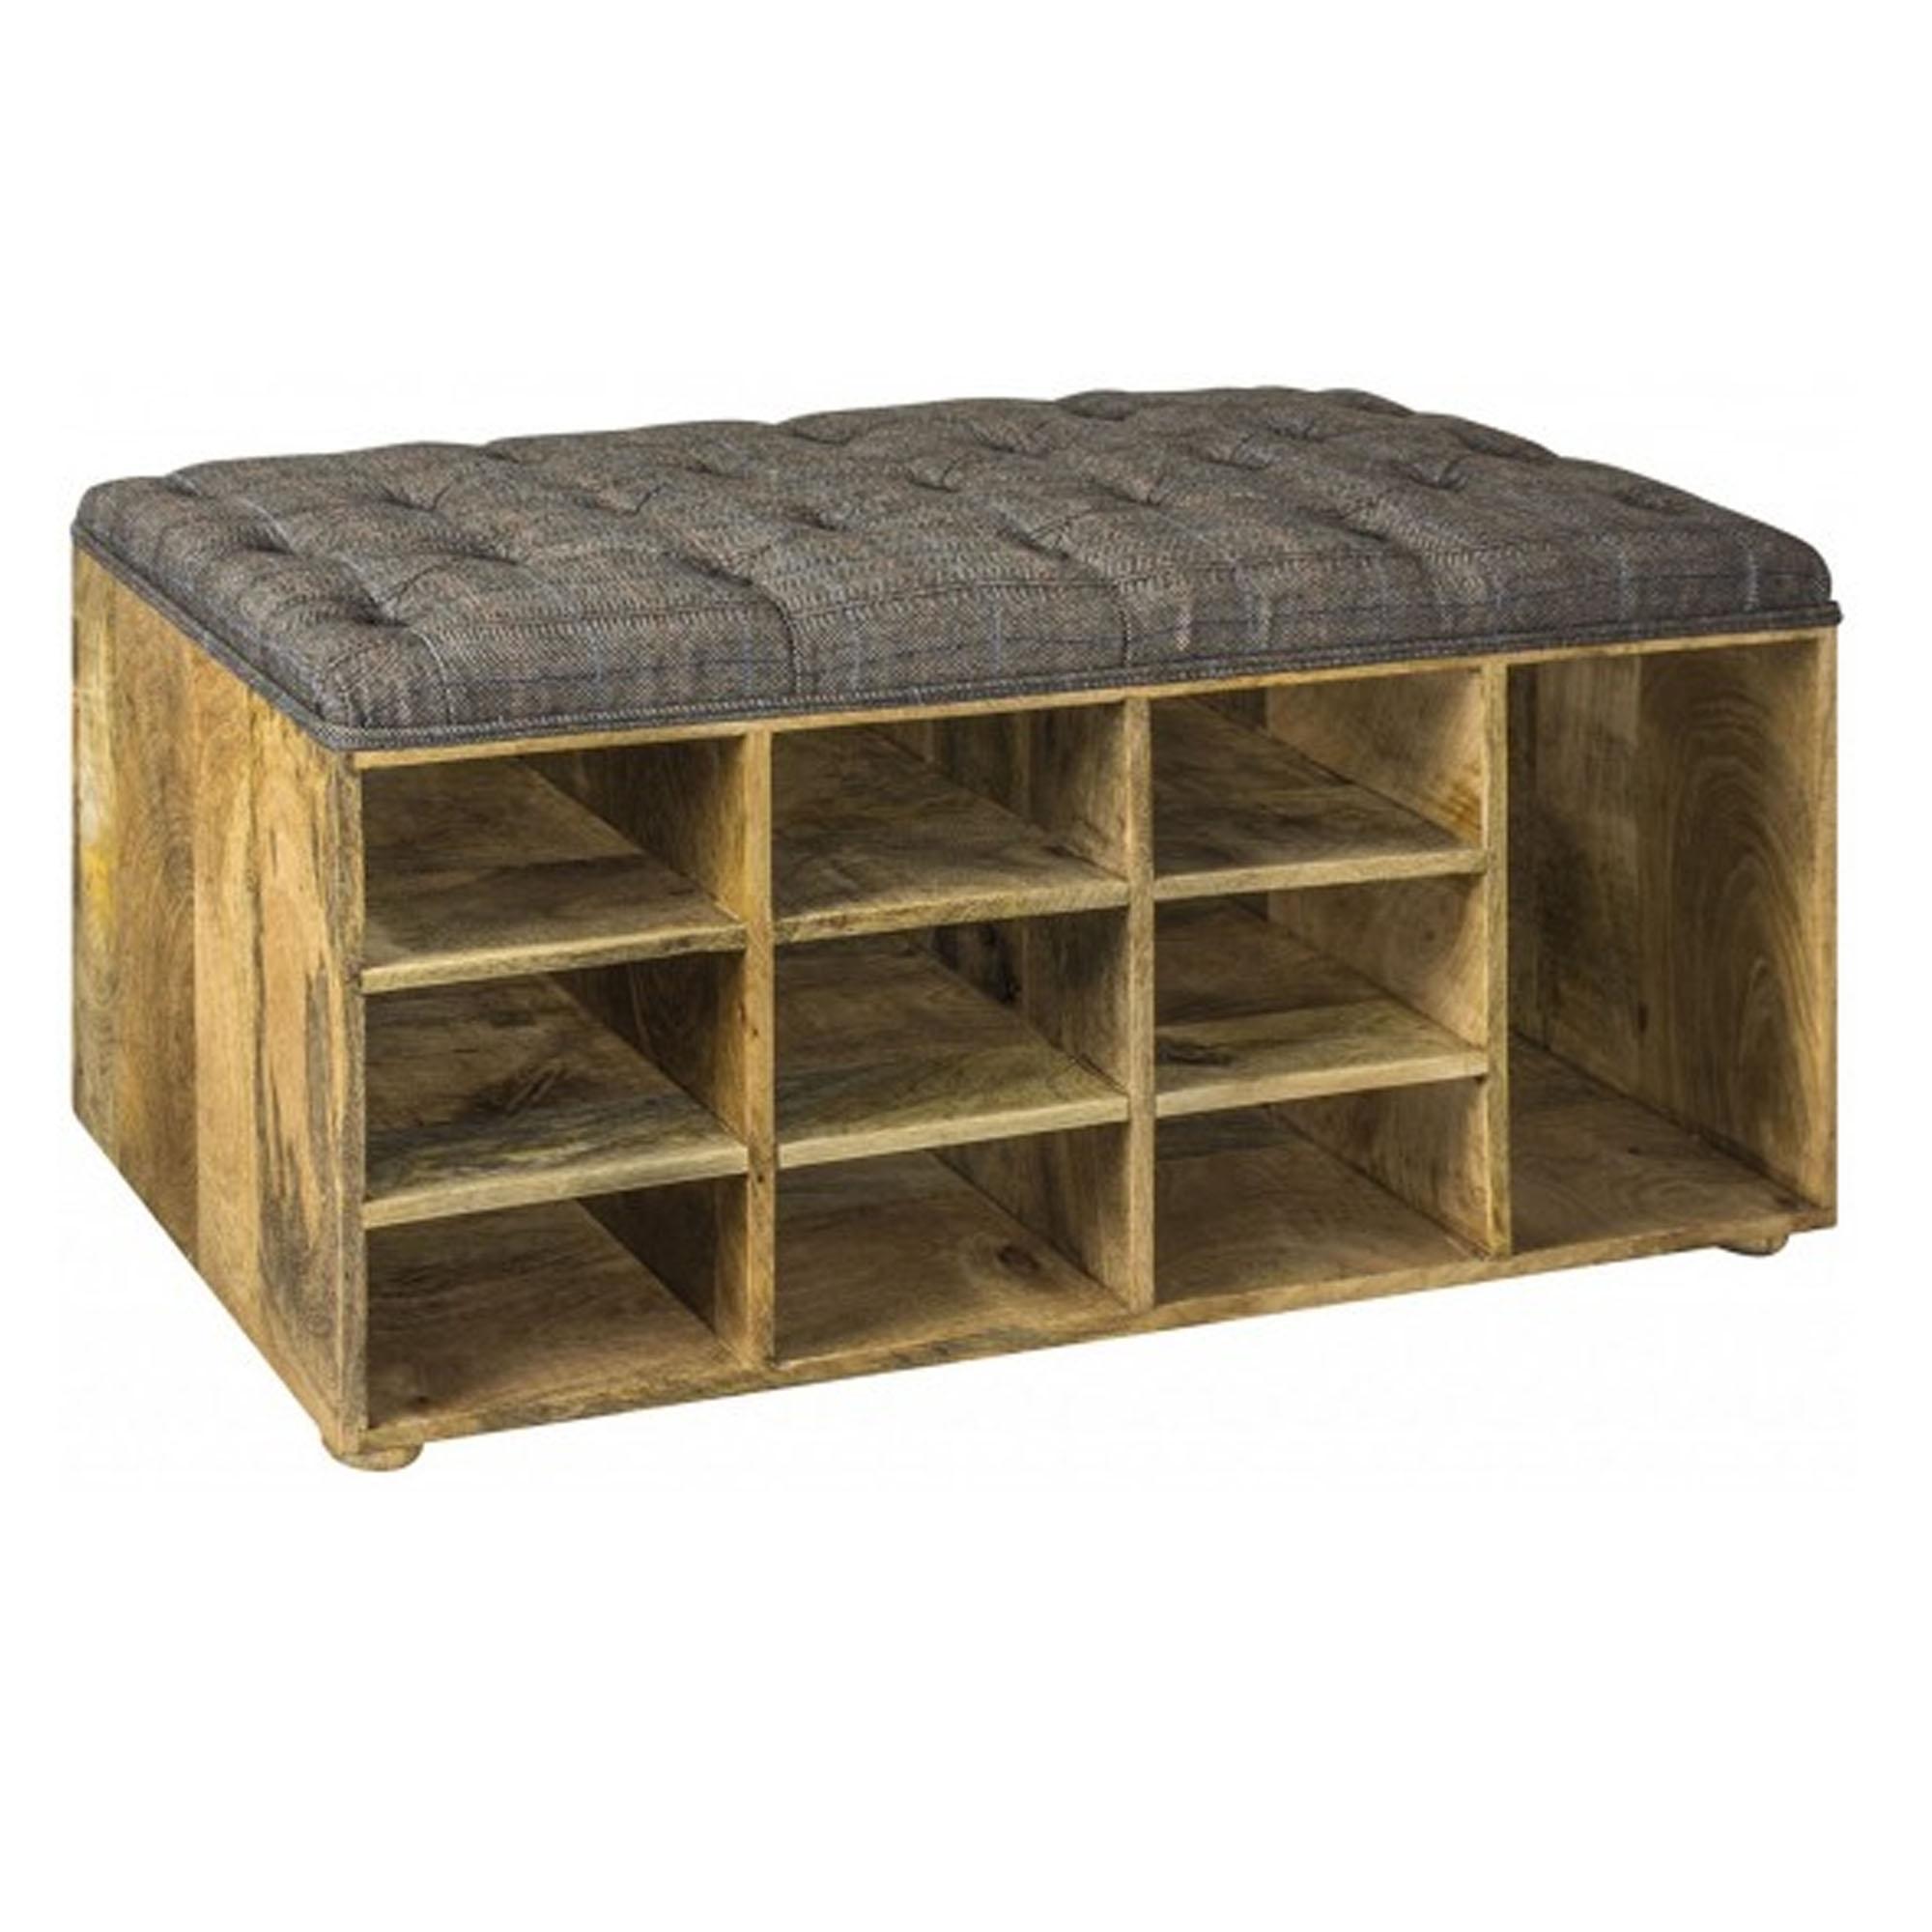 Upholstered Tweed Shoe Storage Bench Homesdirect365